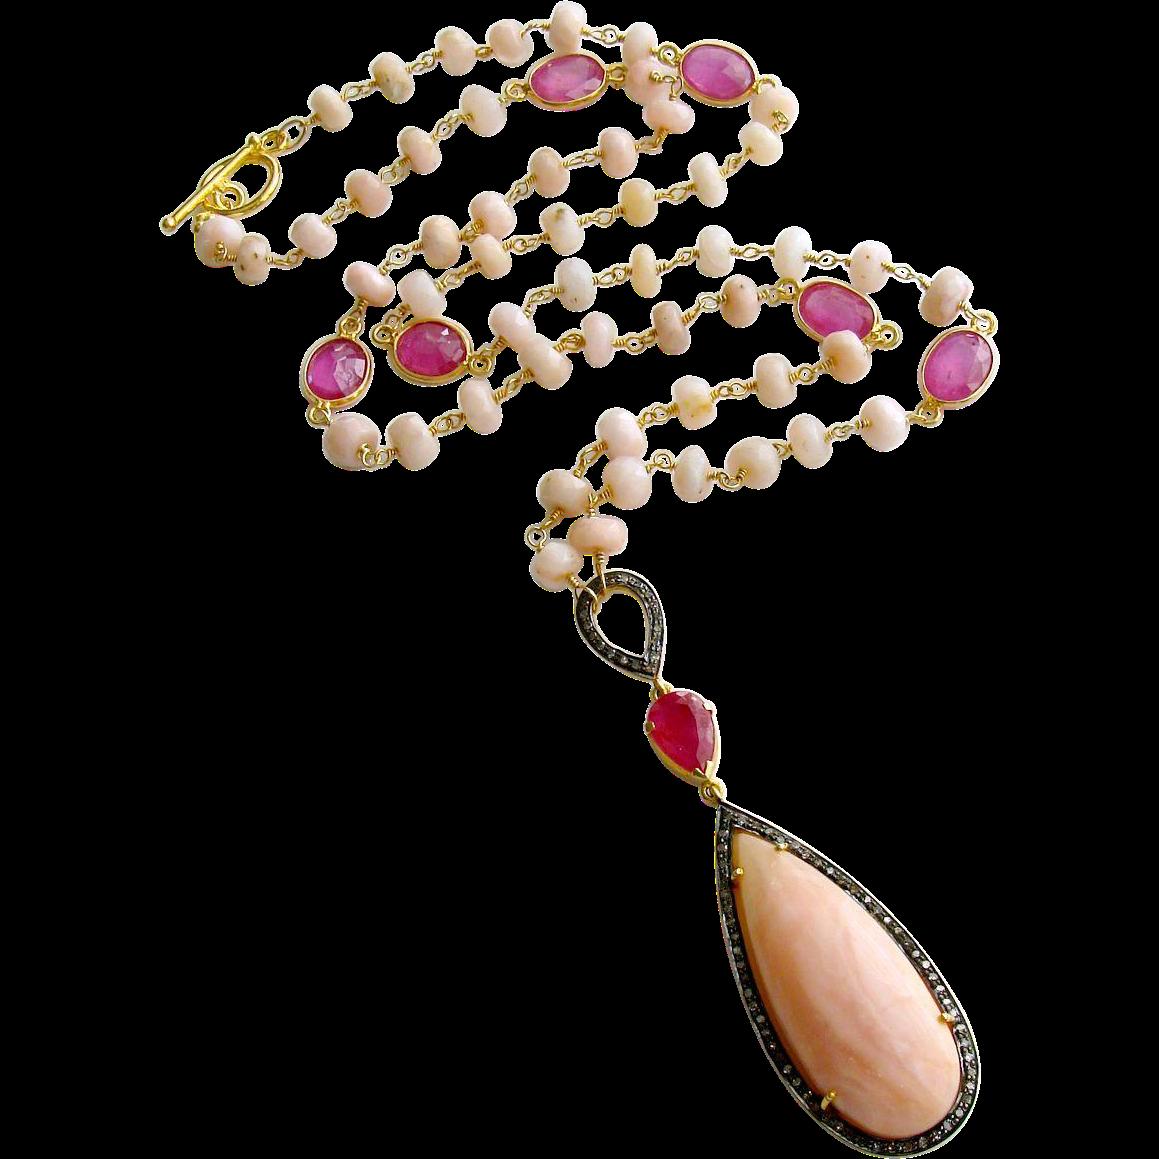 Peruvian Pink Opal Pink Sapphire Diamonds Necklace - Lisette Necklace